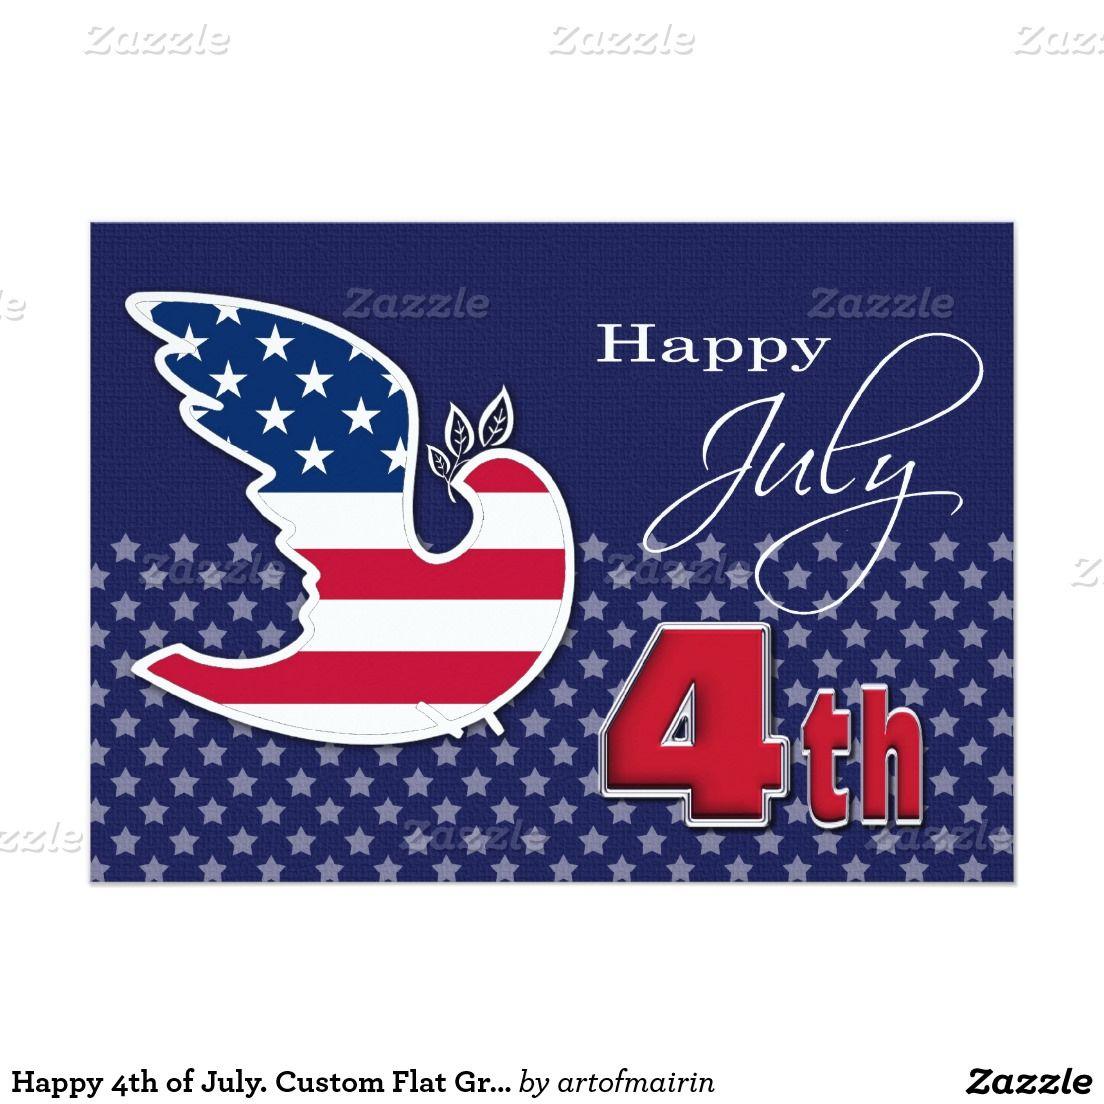 Happy 4th of july custom flat greeting cards party invitations custom flat greeting cards m4hsunfo